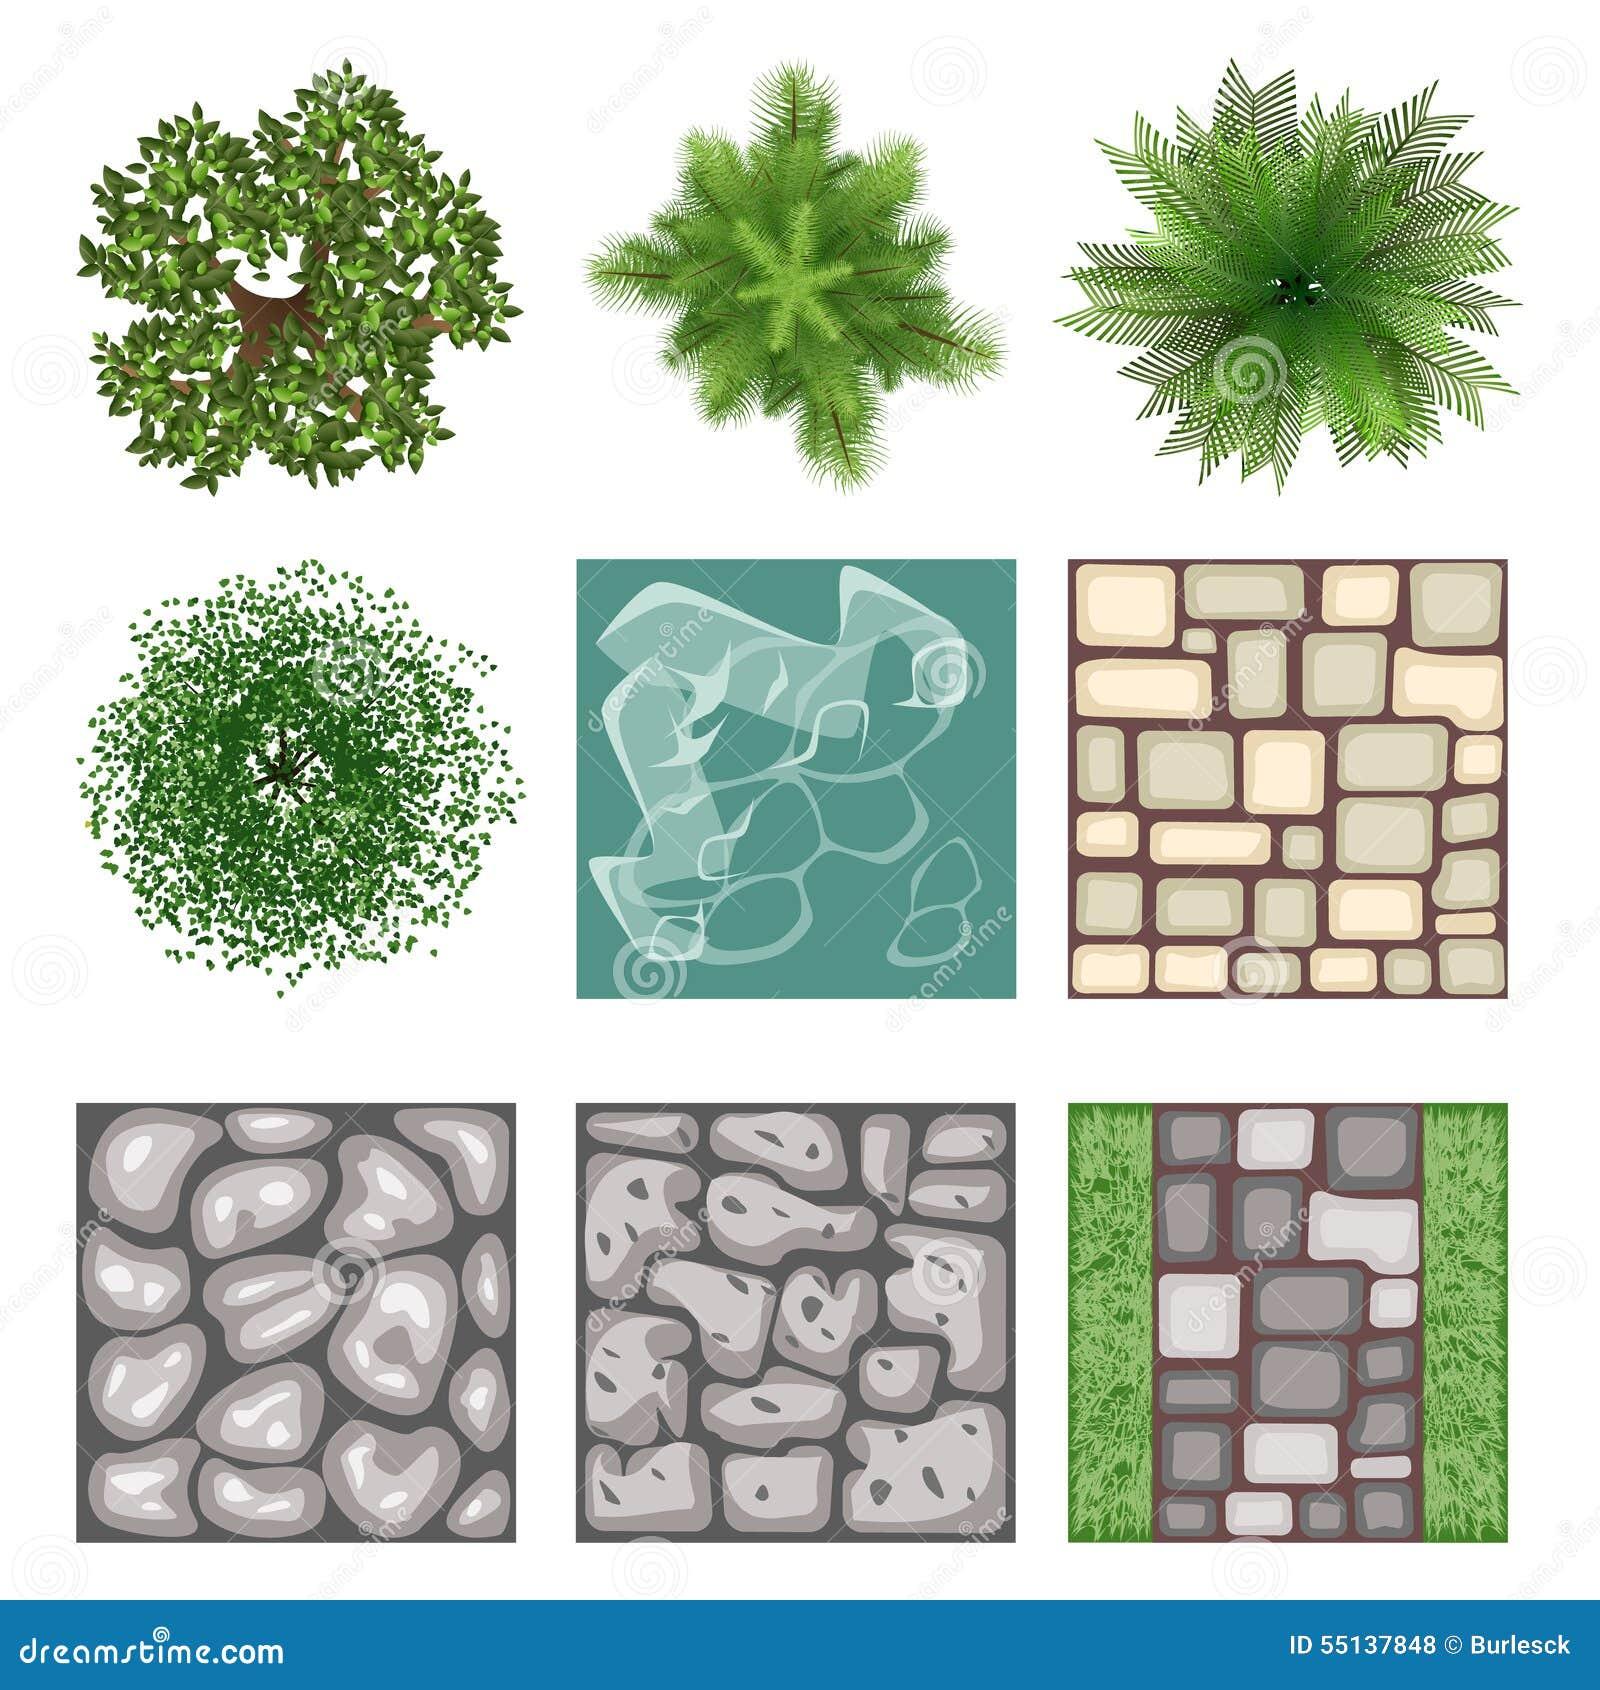 Landscape design top view vector elements stock vector for Garden design elements